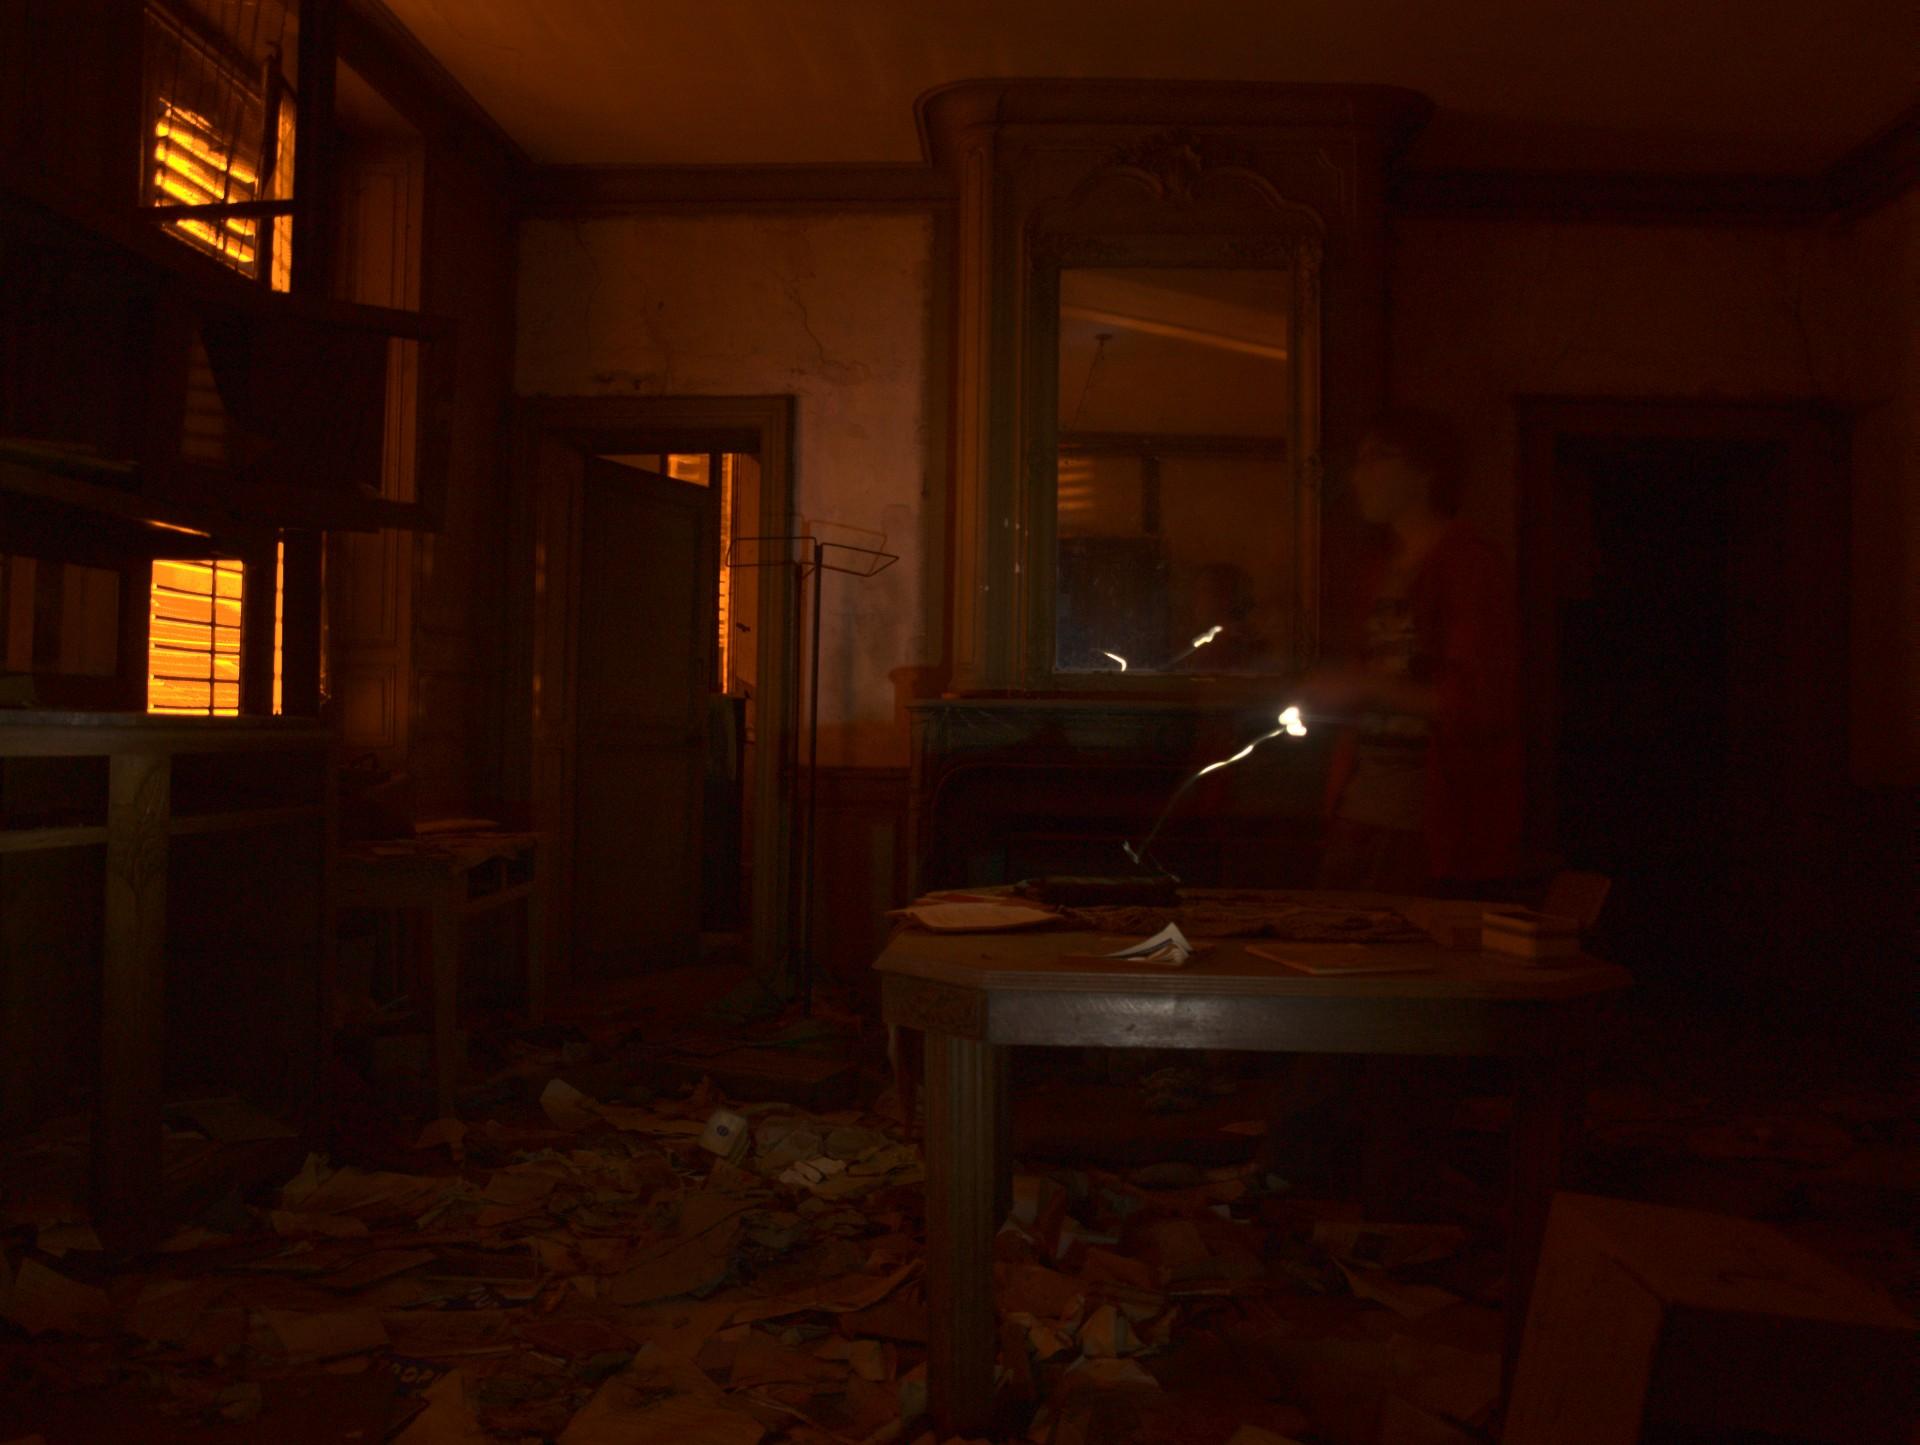 haunted House 0x04